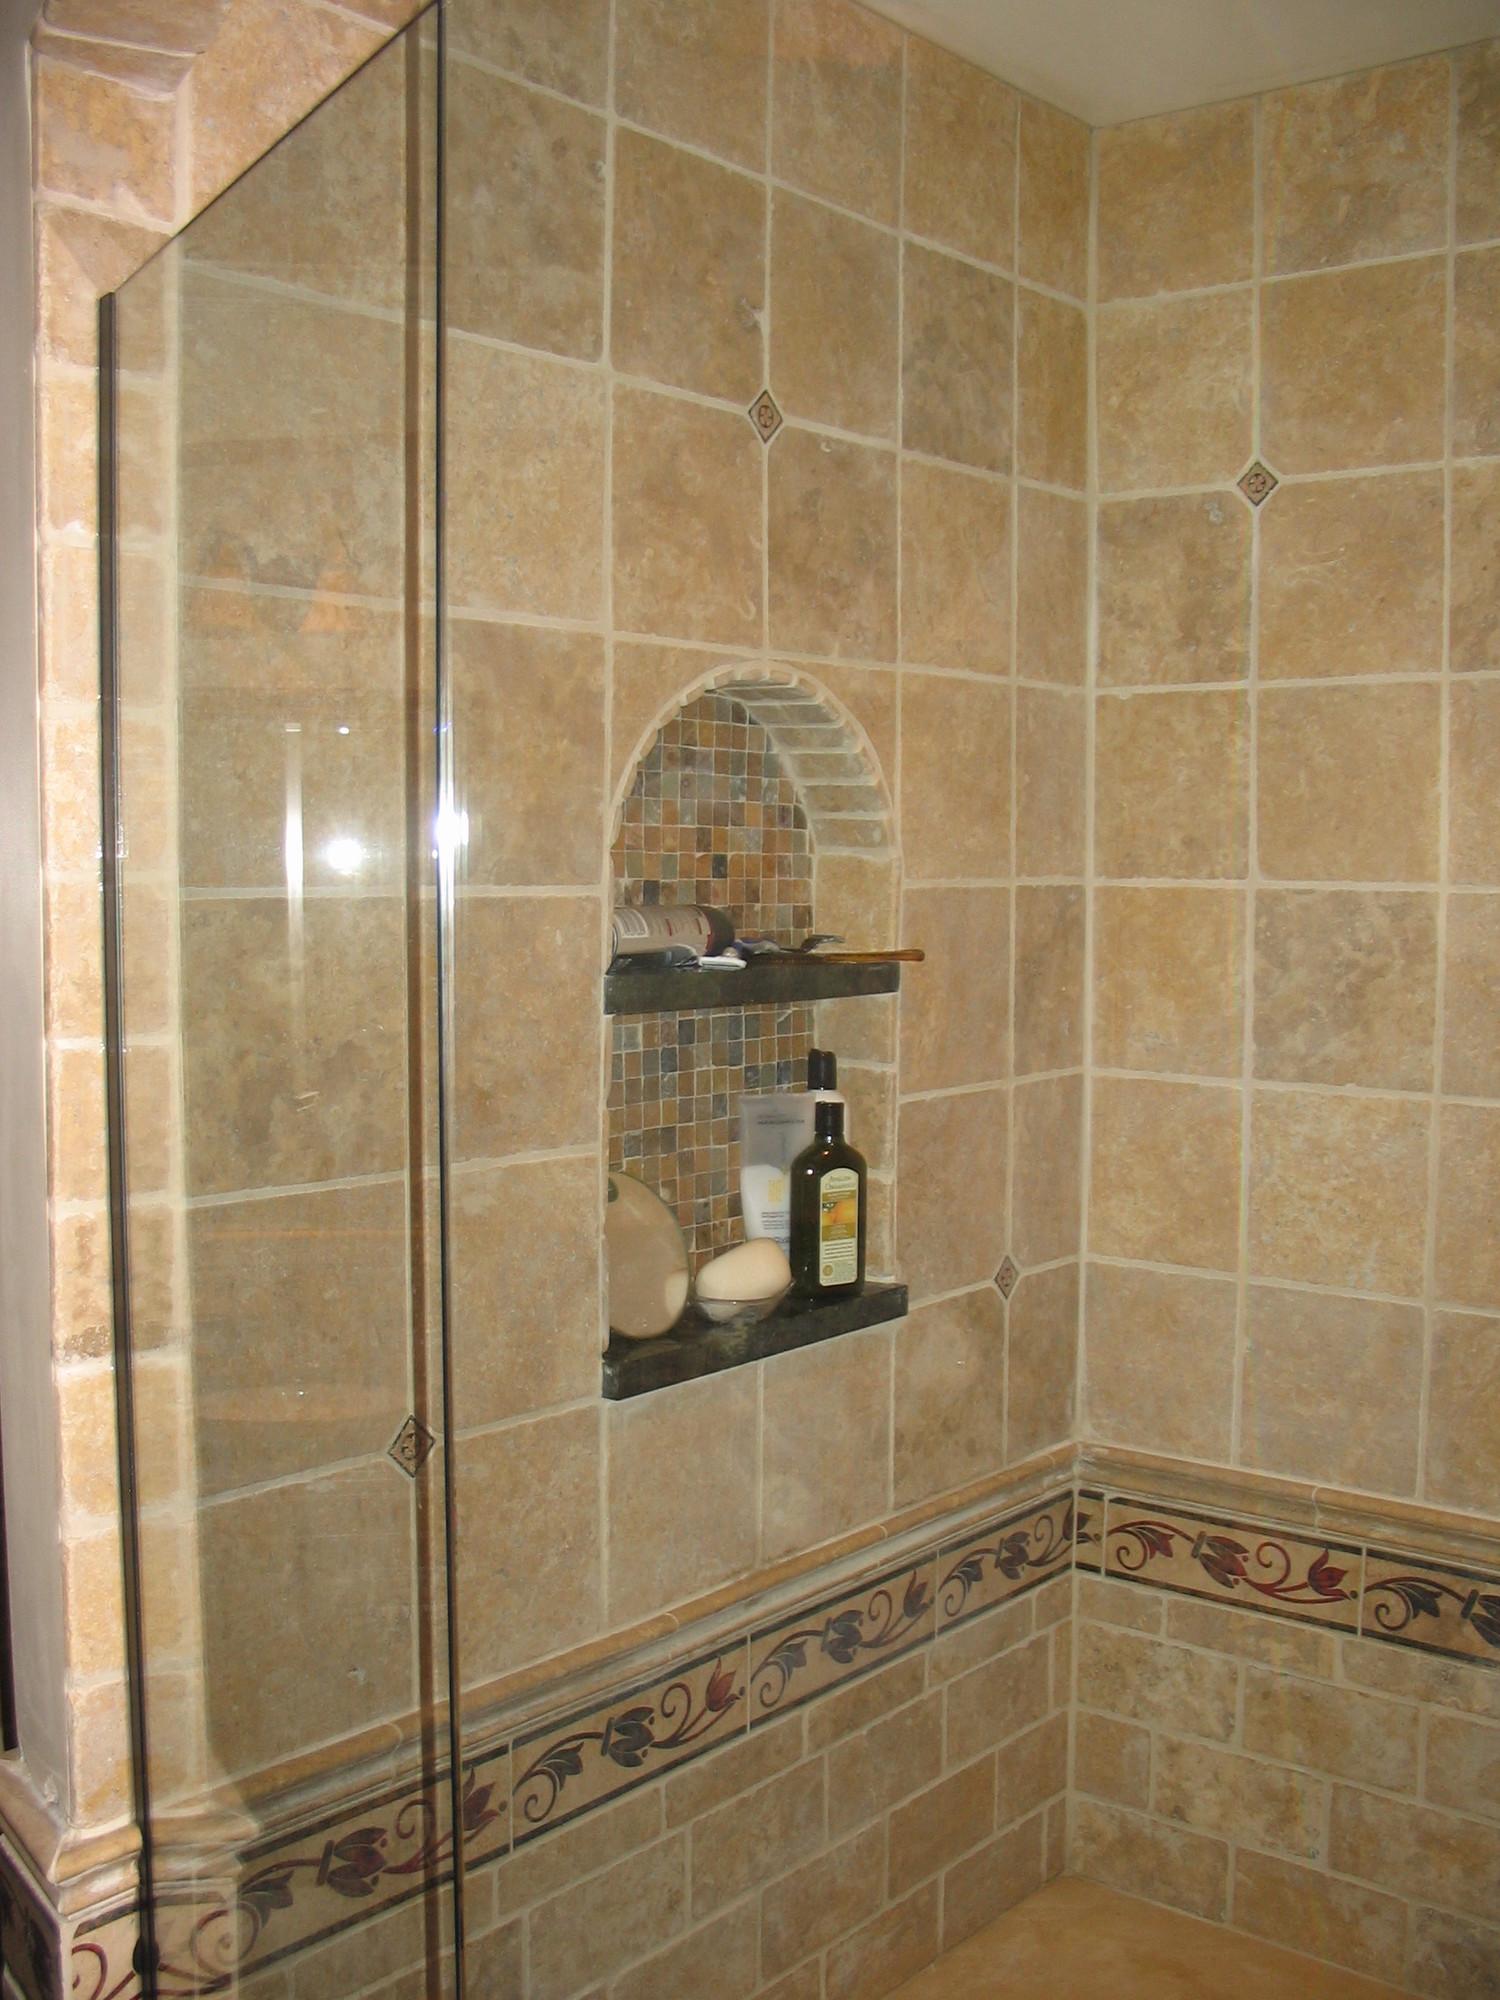 Bathrooms Tile Installation